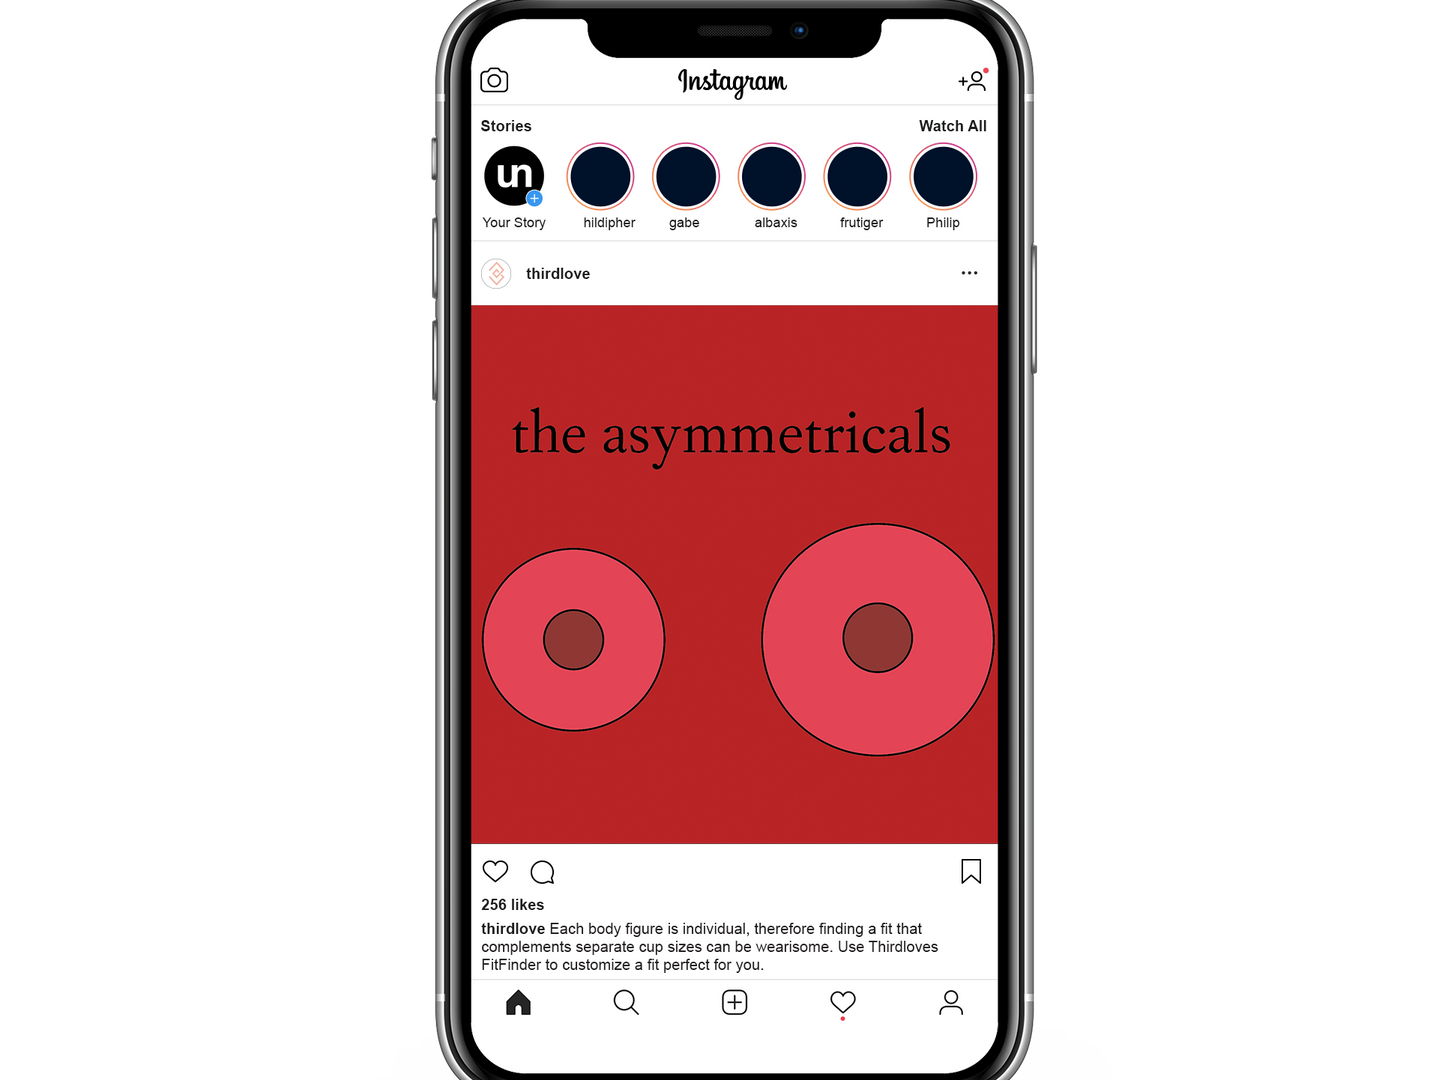 the asymmetrical